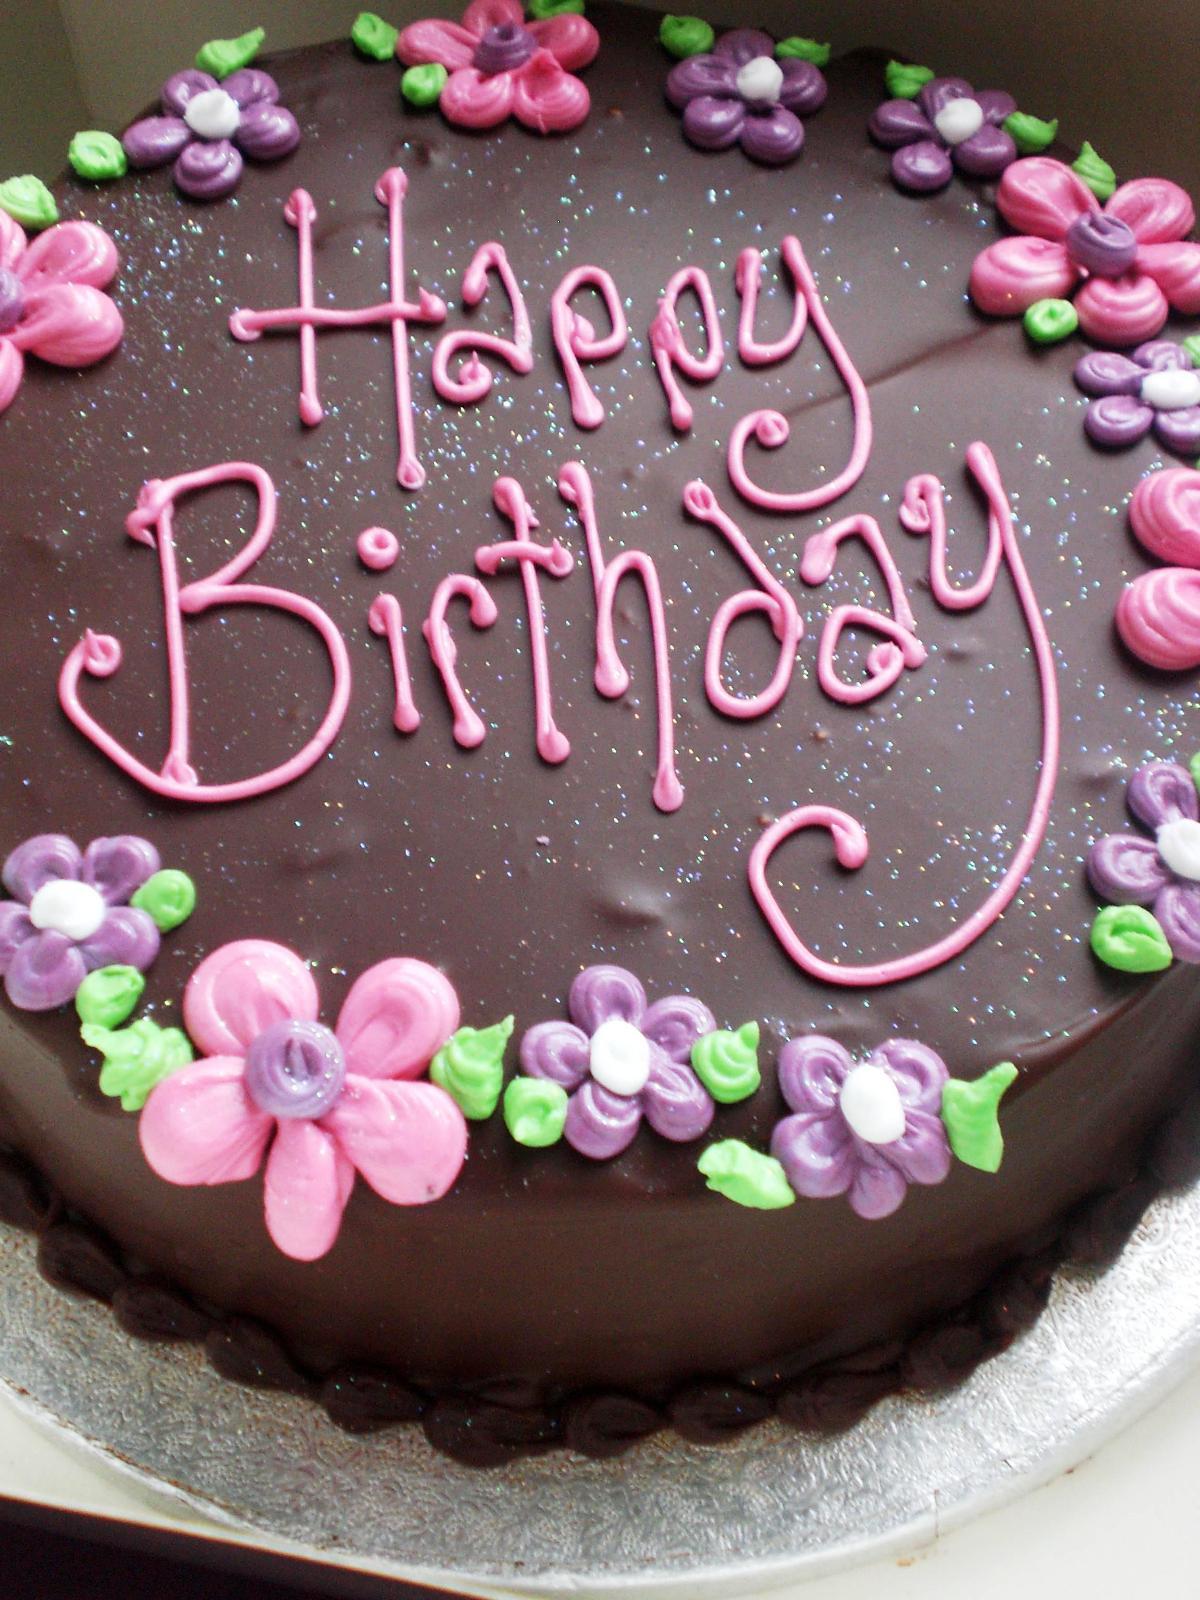 Tremendous 8 Safeway Cakes Order Photo Safeway Order Birthday Cake Safeway Personalised Birthday Cards Paralily Jamesorg